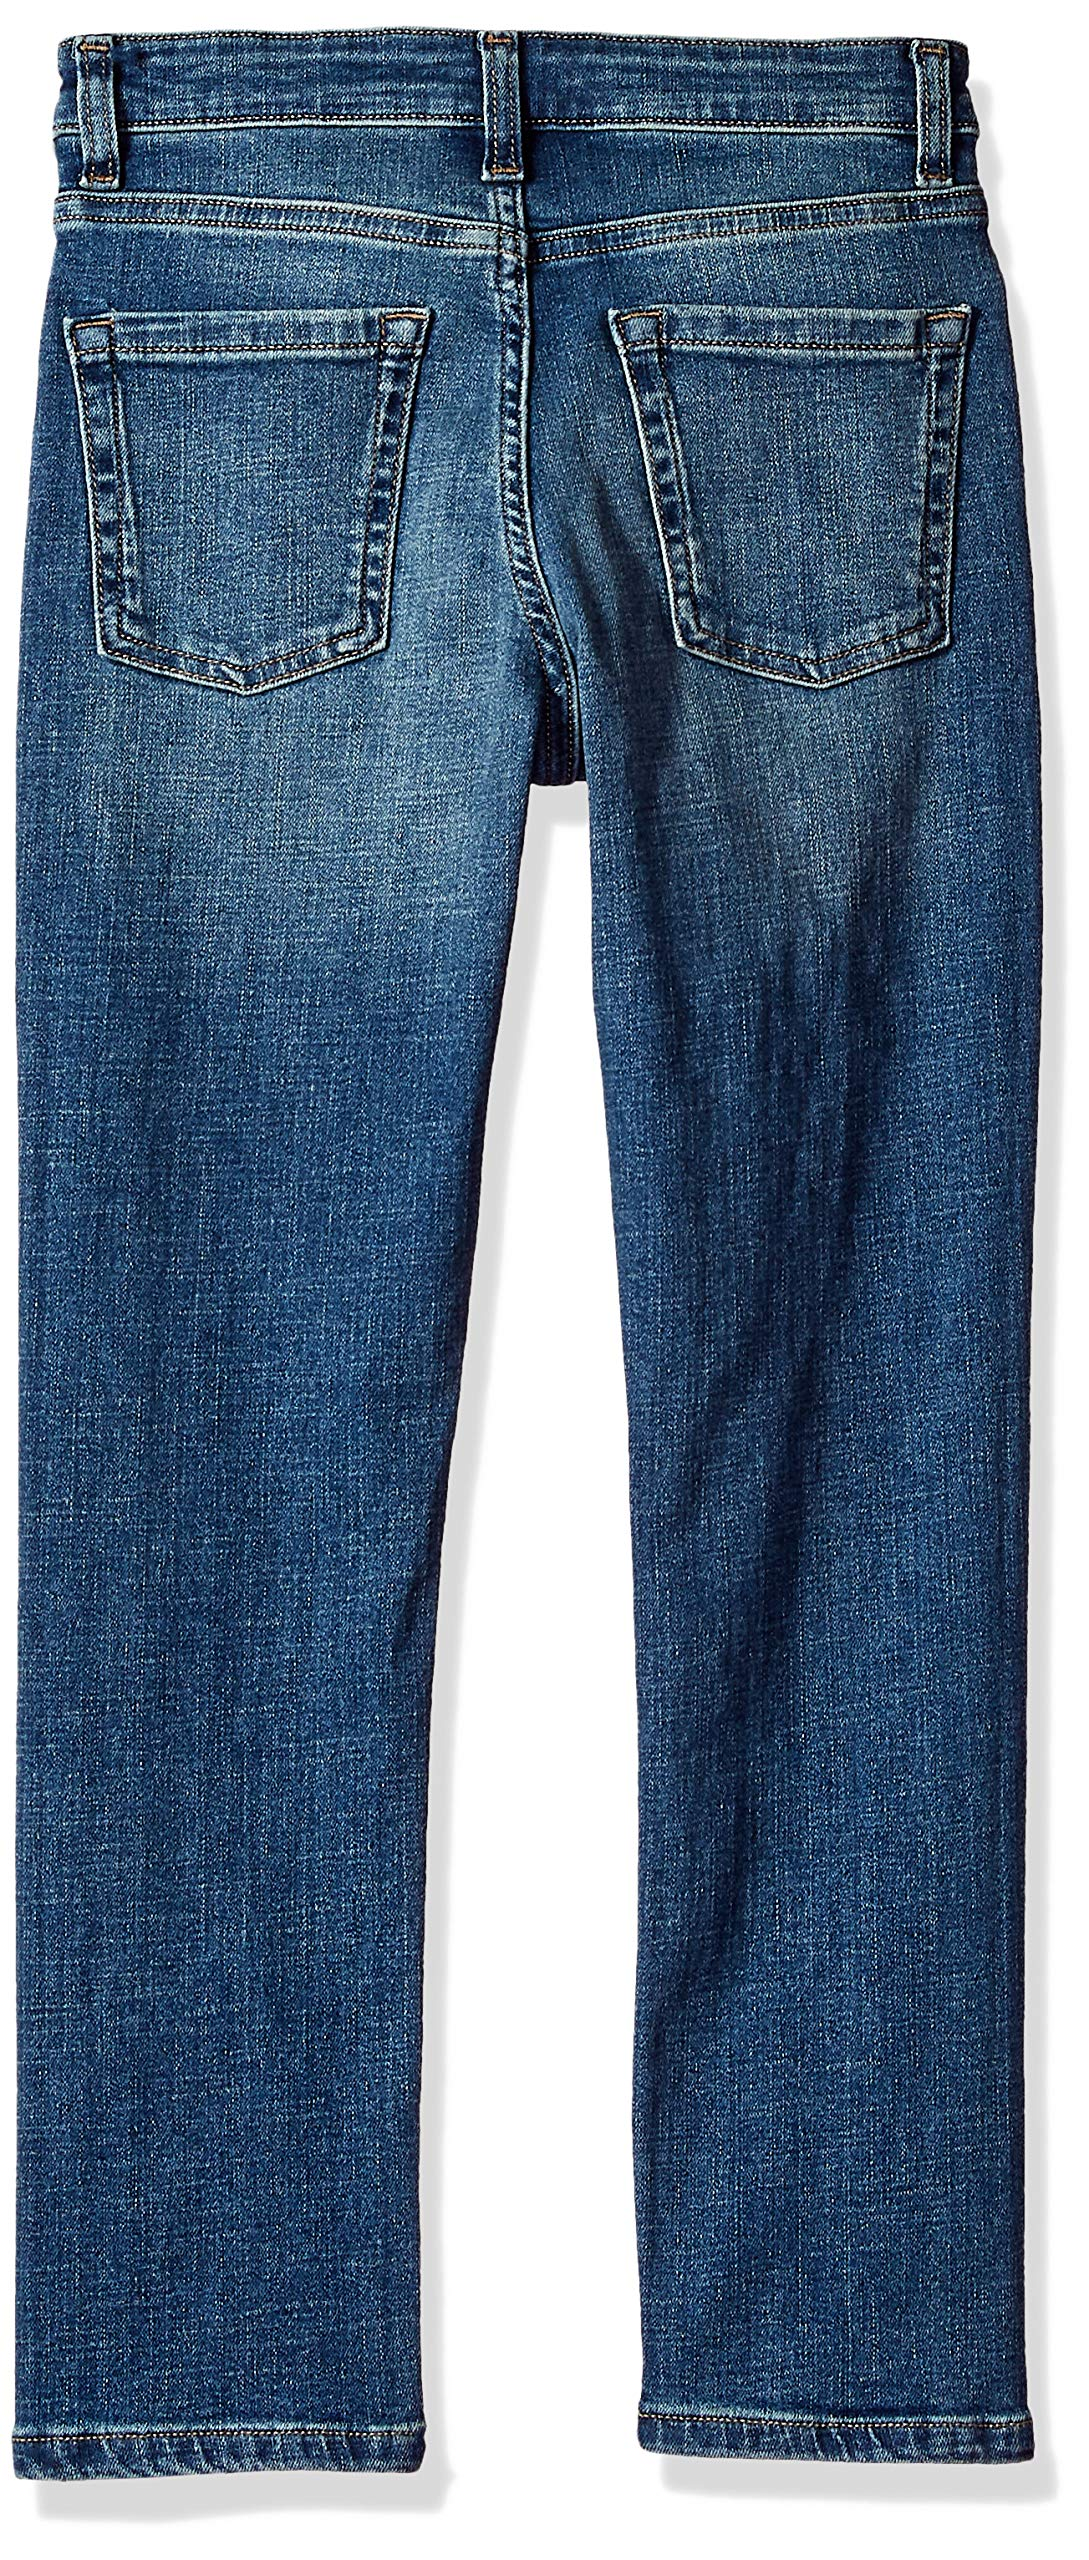 Amazon Essentials Boys' Slim-Fit Jeans - Denim Fit